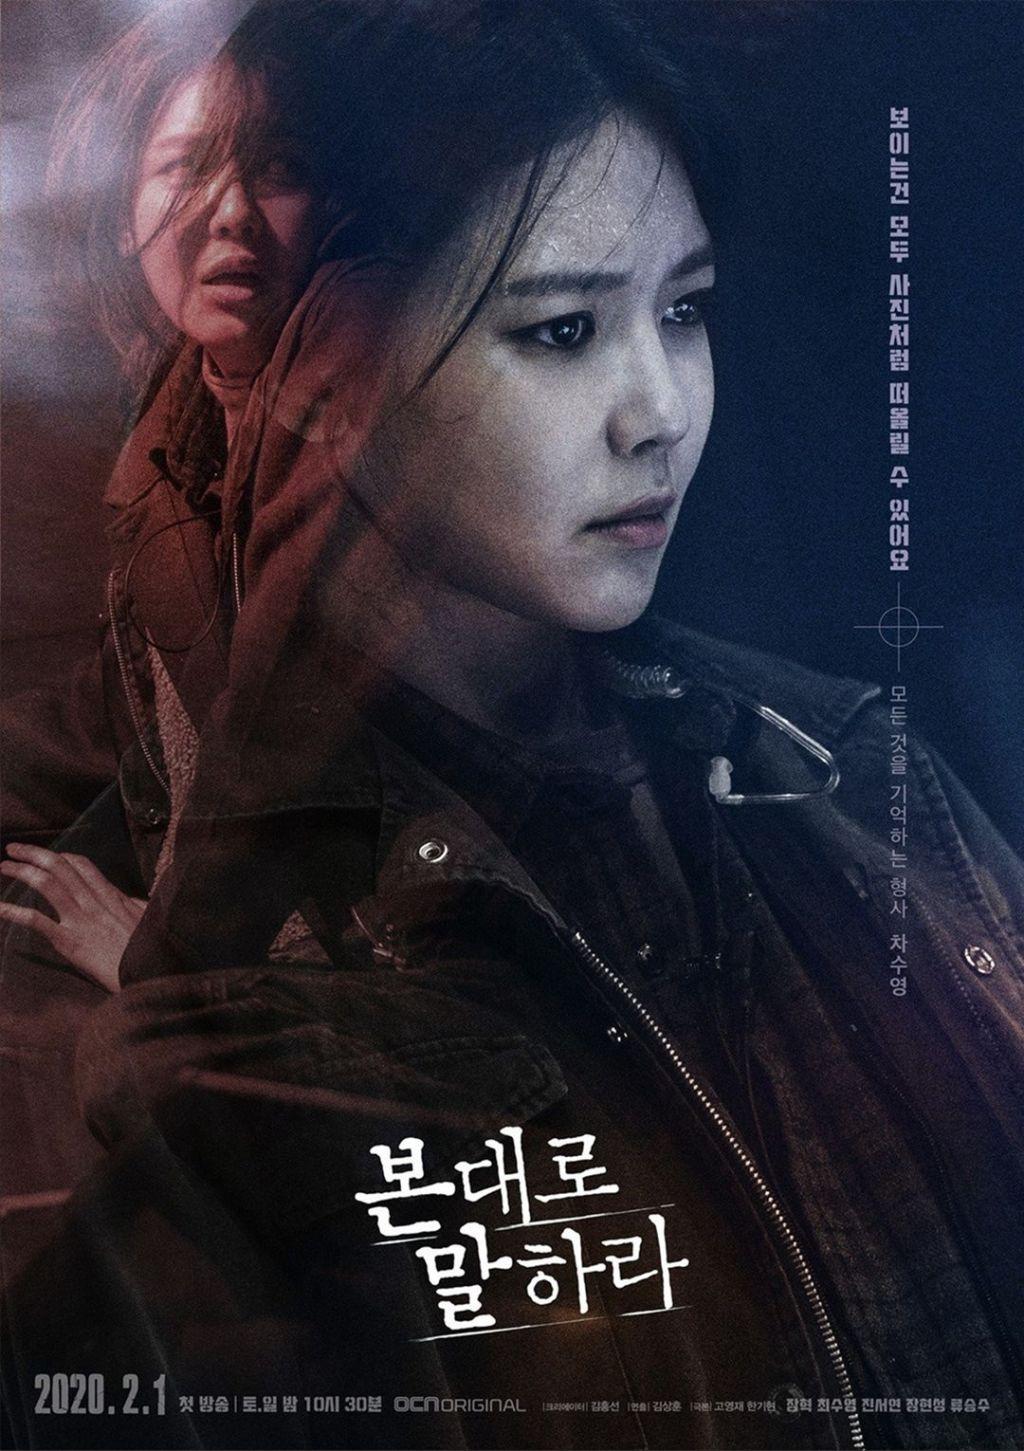 Choi Soo Young sebagai Cha Soo Young